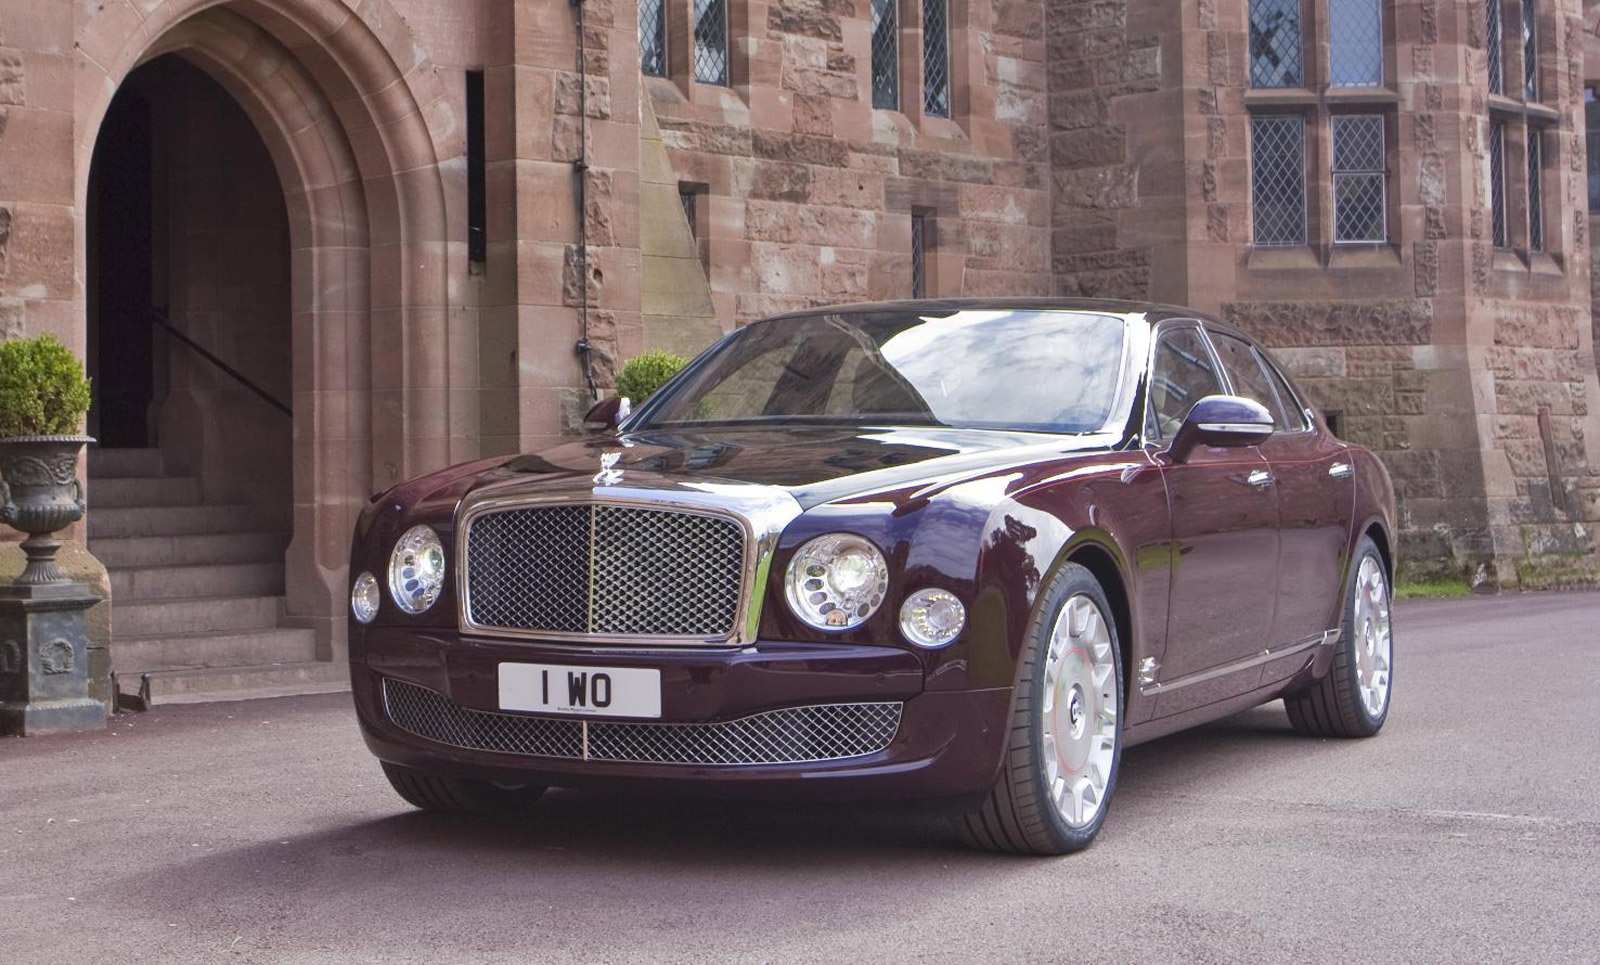 Queen Elizabeth Bentley State Limousine >> Bentley Honors The Queen's Diamond Jubilee With Special Mulsanne